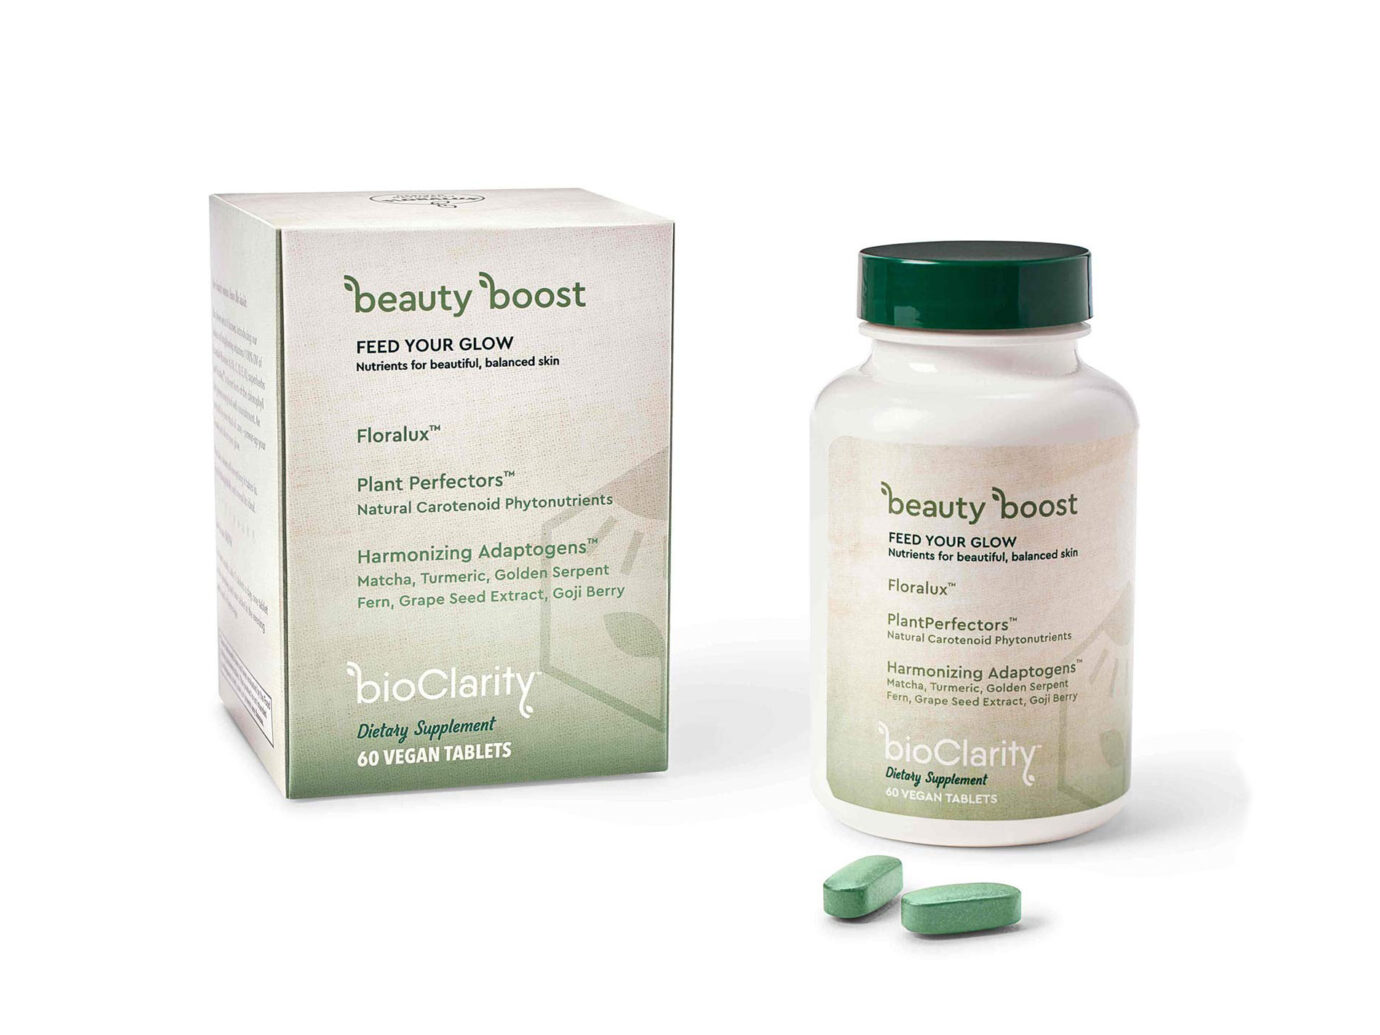 bioClarity Beauty Boost Supplement